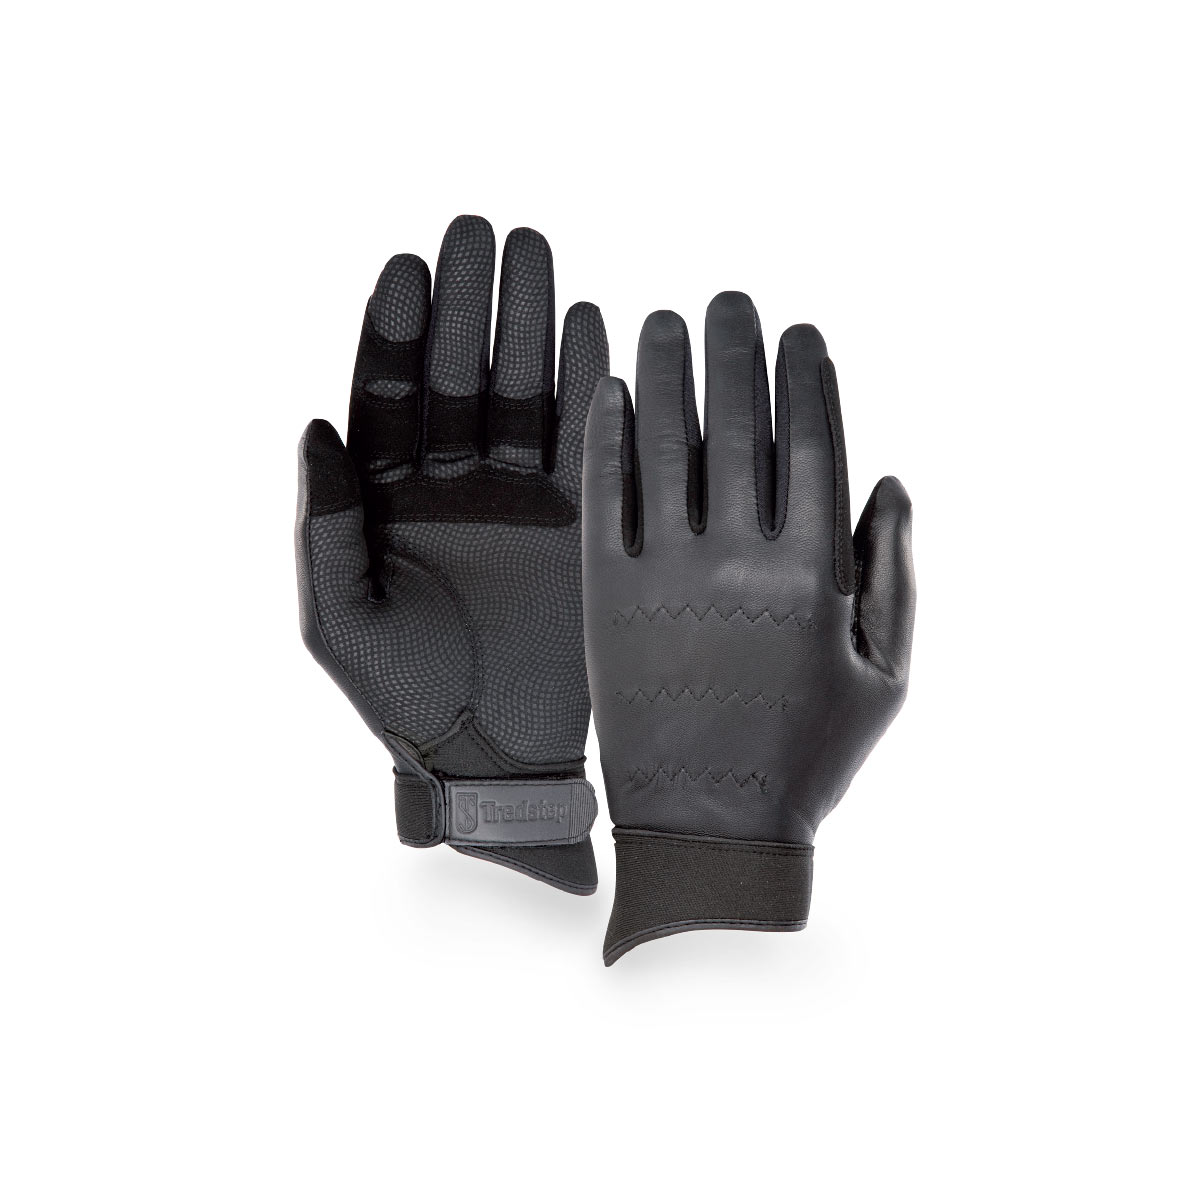 Tredstep Show Hunter Riding Gloves